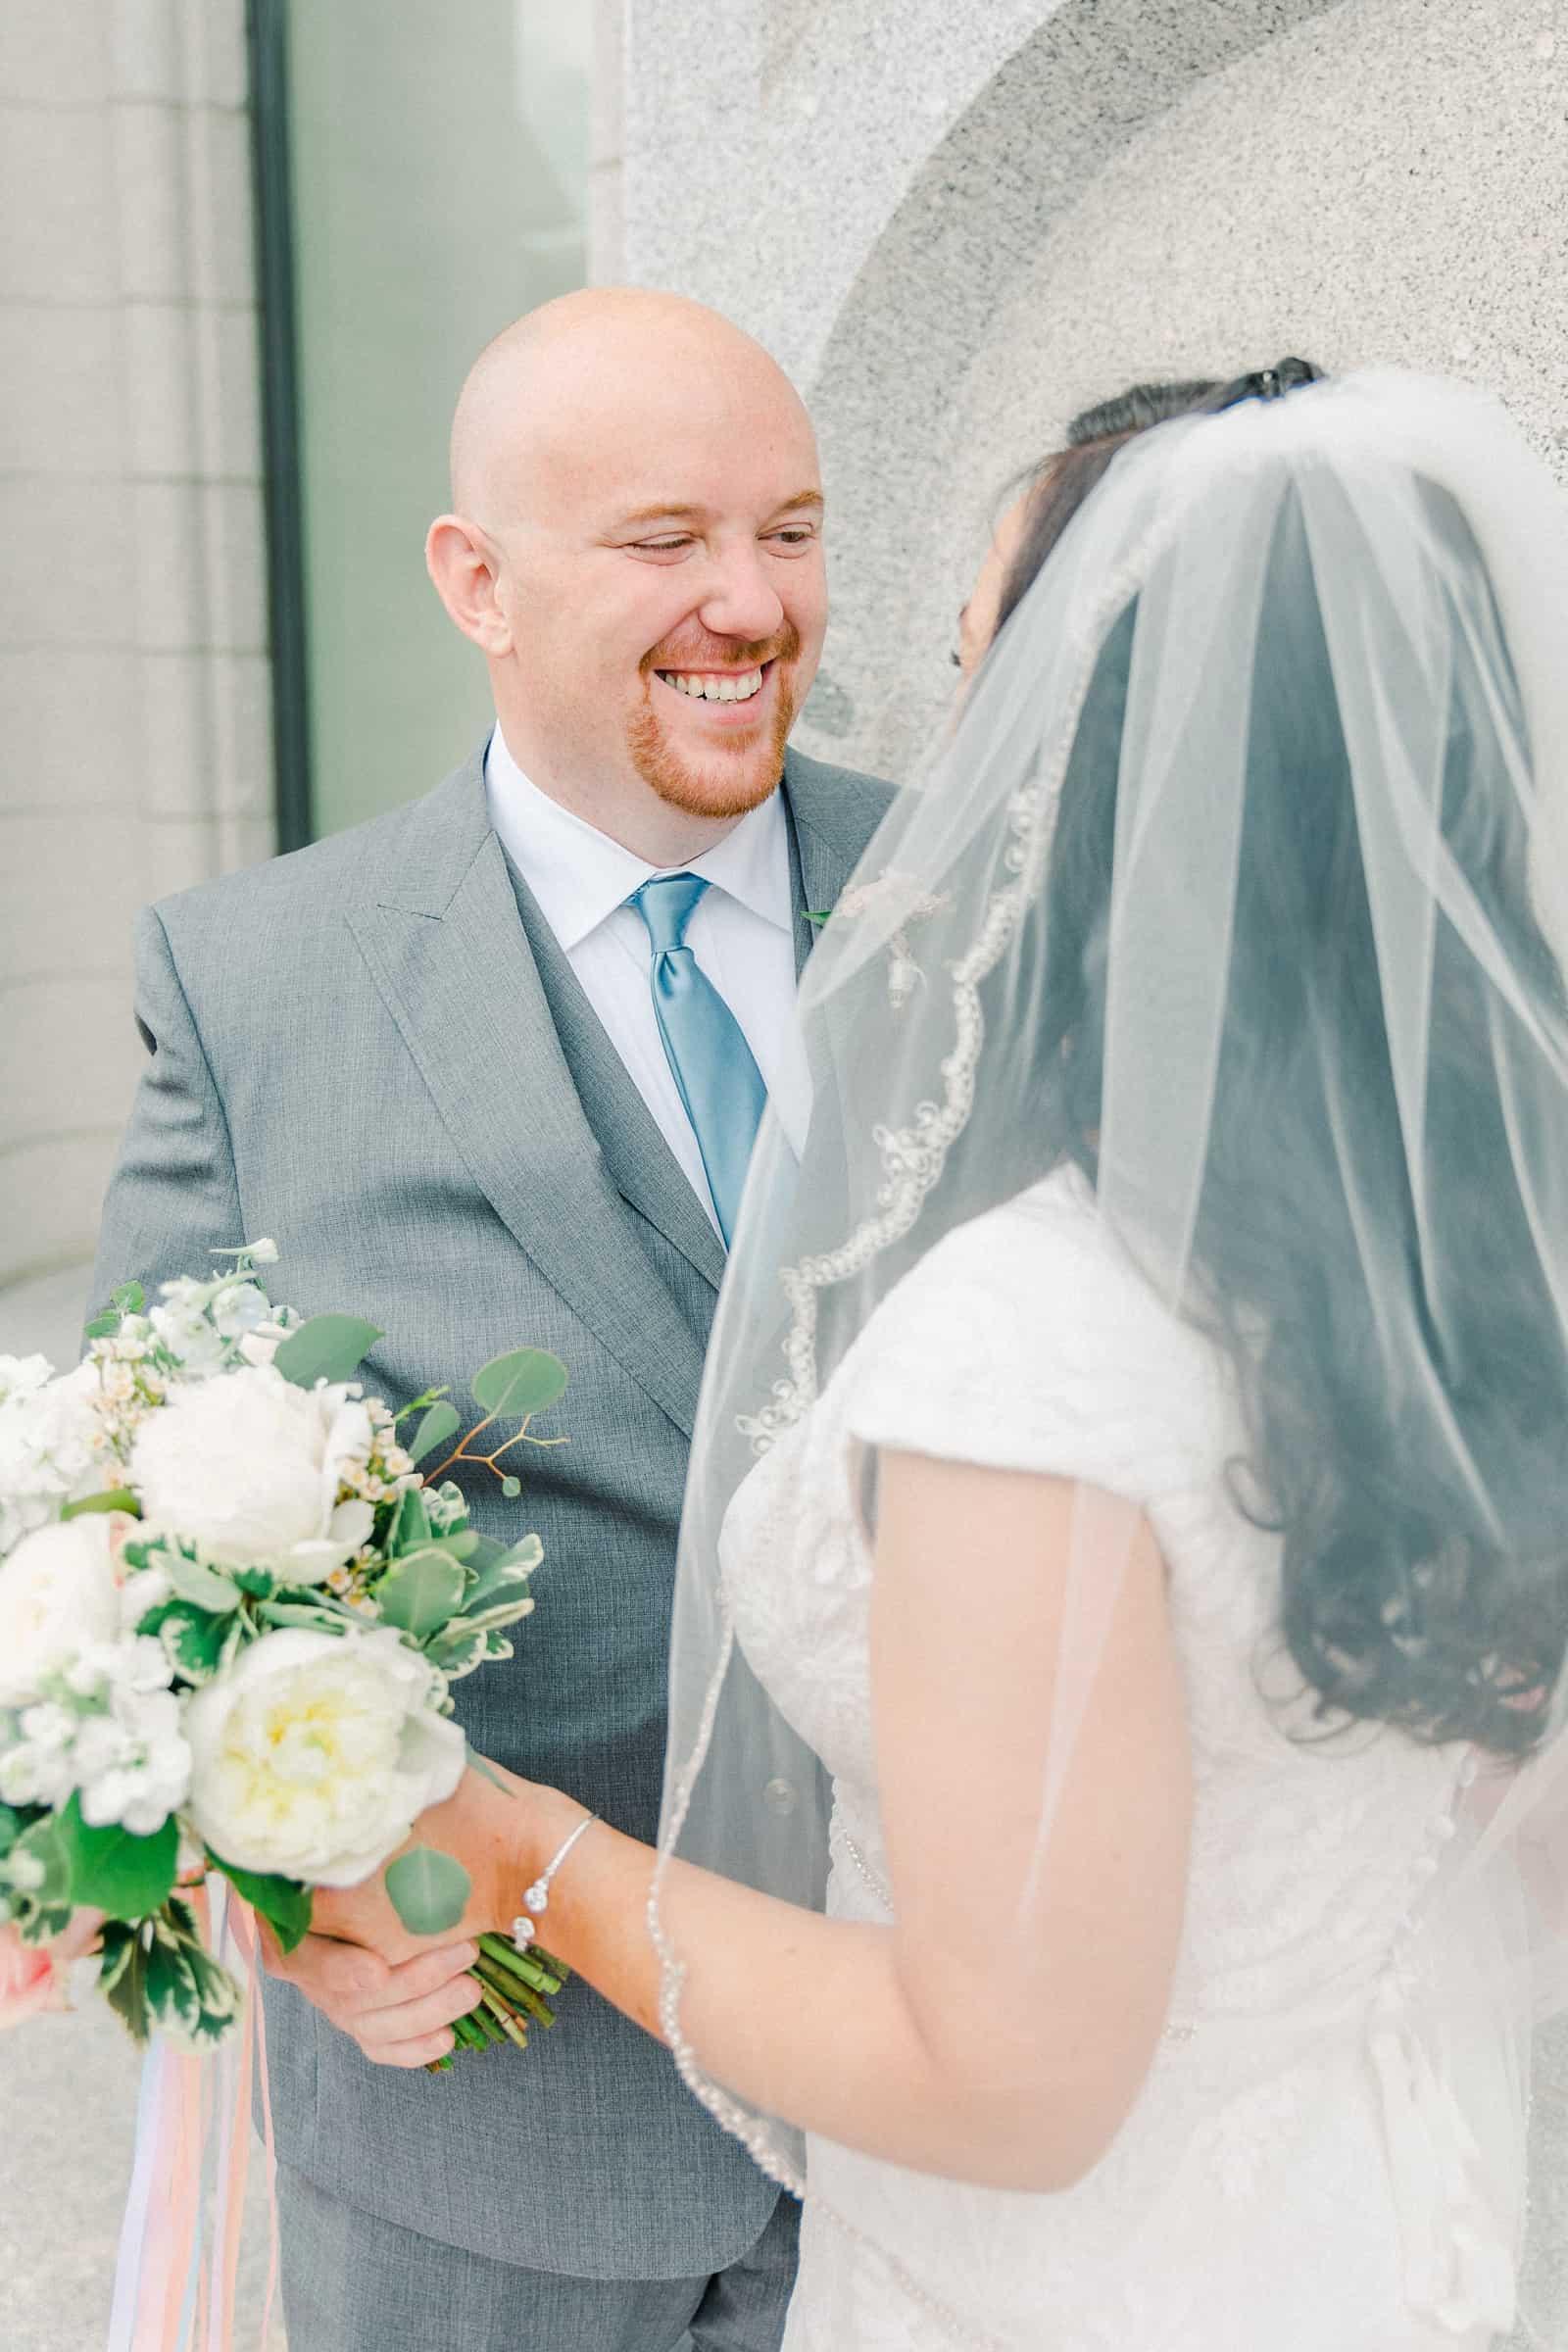 Thomas S. Monson Center Wedding, Salt Lake LDS Temple Wedding, Utah wedding photography. groom in light gray suit and blue tie